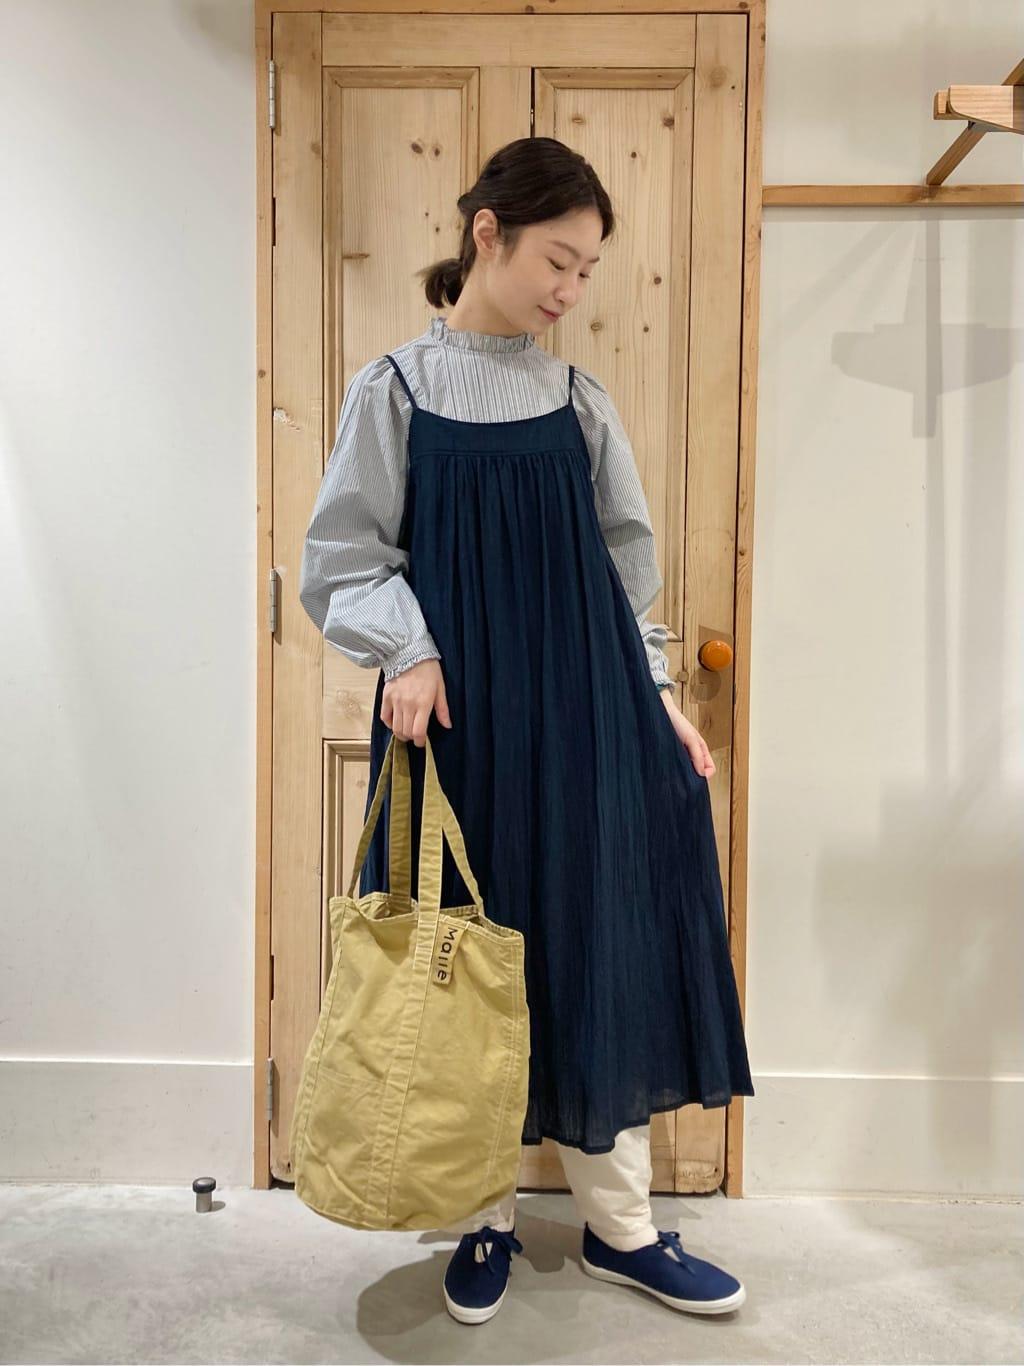 Malle chambre de charme 調布パルコ 身長:162cm 2021.08.28